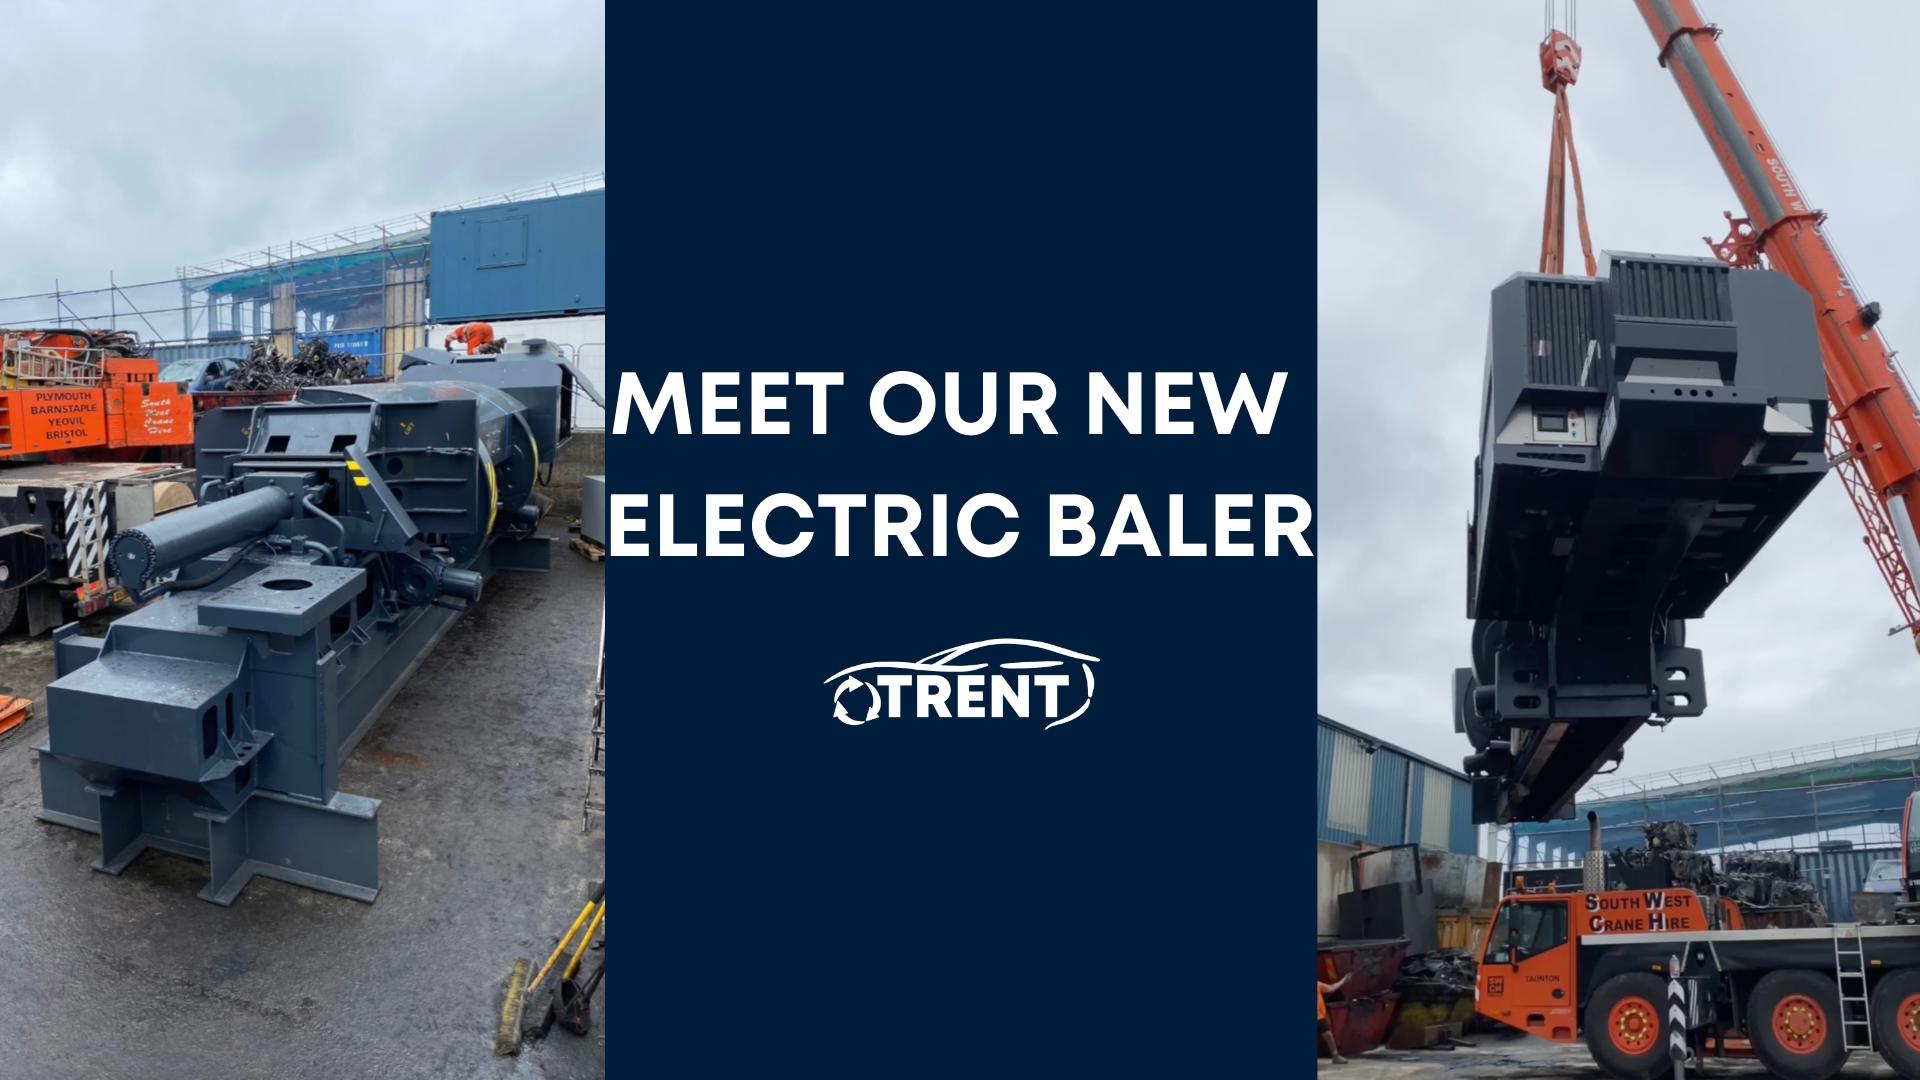 Meet our New Electric Baler